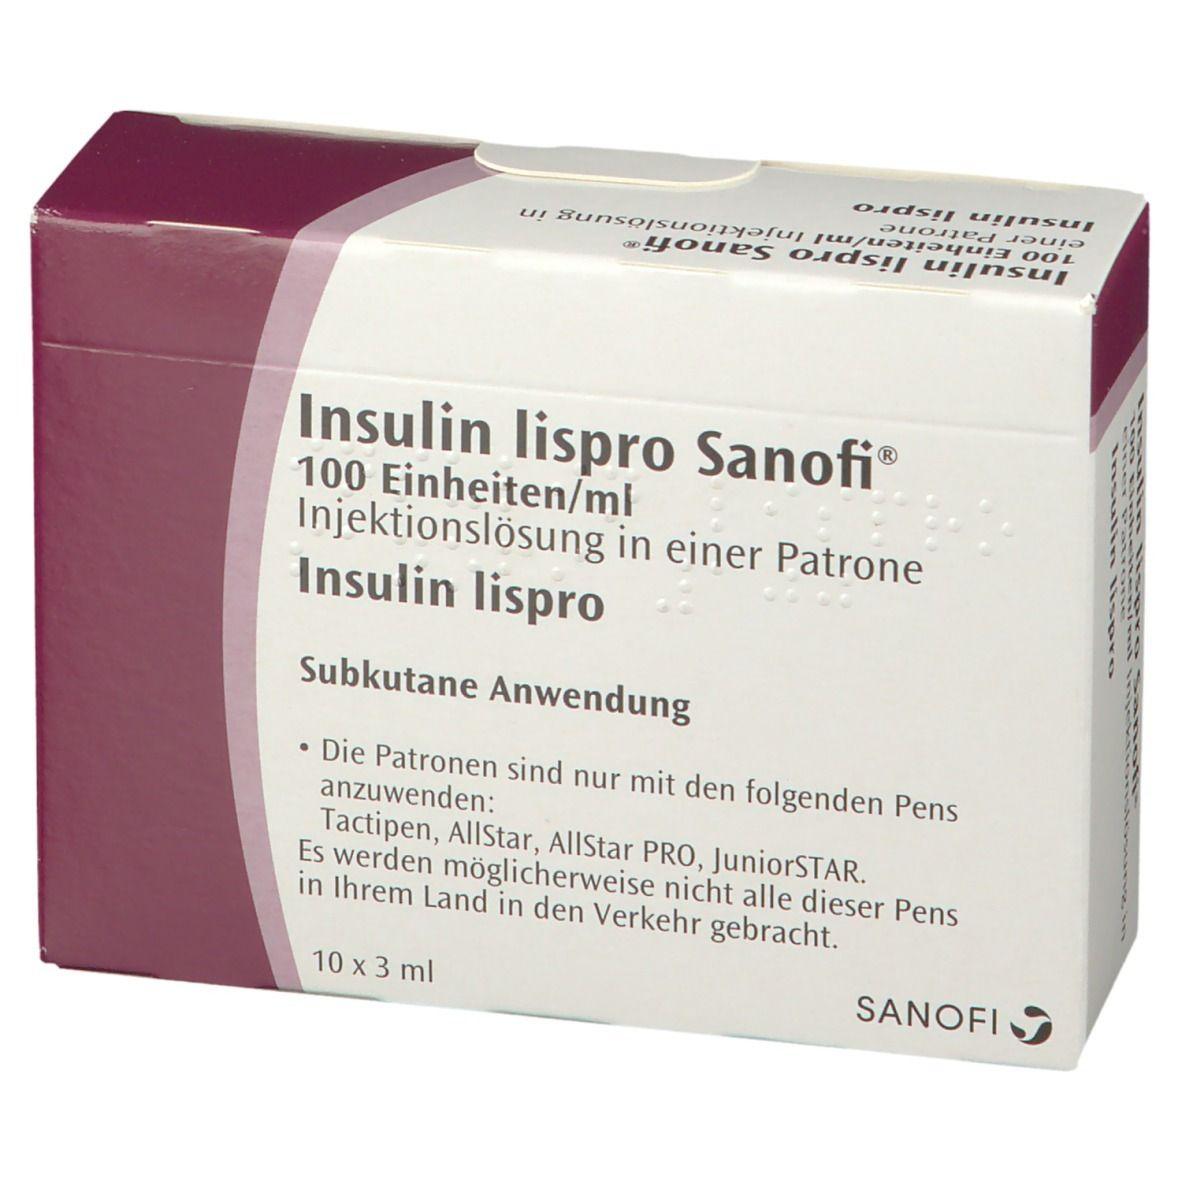 INSULIN LISPRO Sanofi 100 E/ml Inj.-Lsg.Patrone 10X3 ml ...